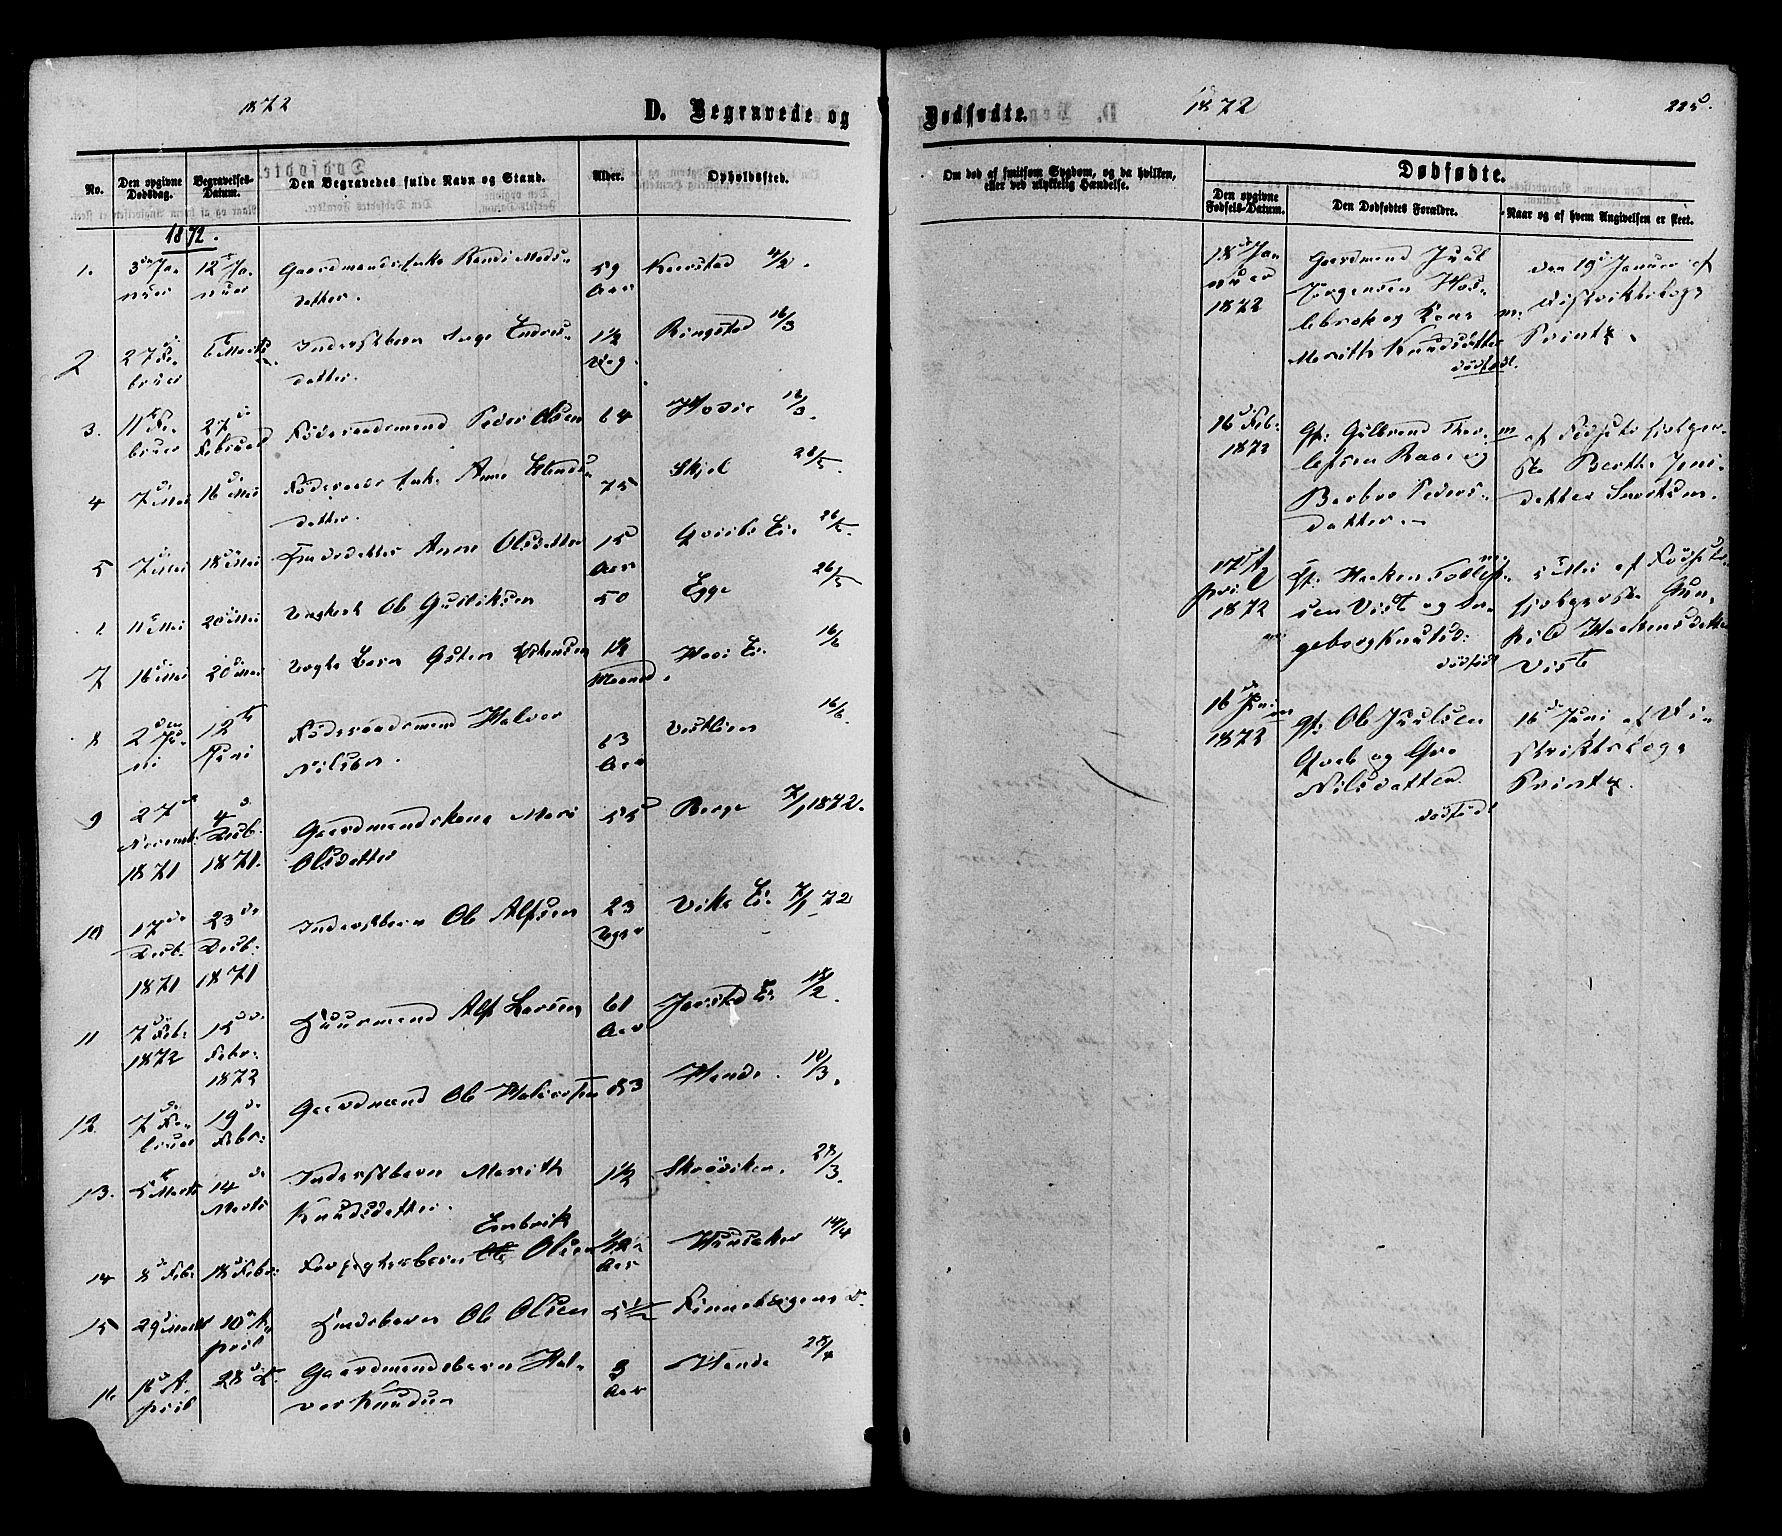 SAH, Vestre Slidre prestekontor, Ministerialbok nr. 3, 1865-1880, s. 225